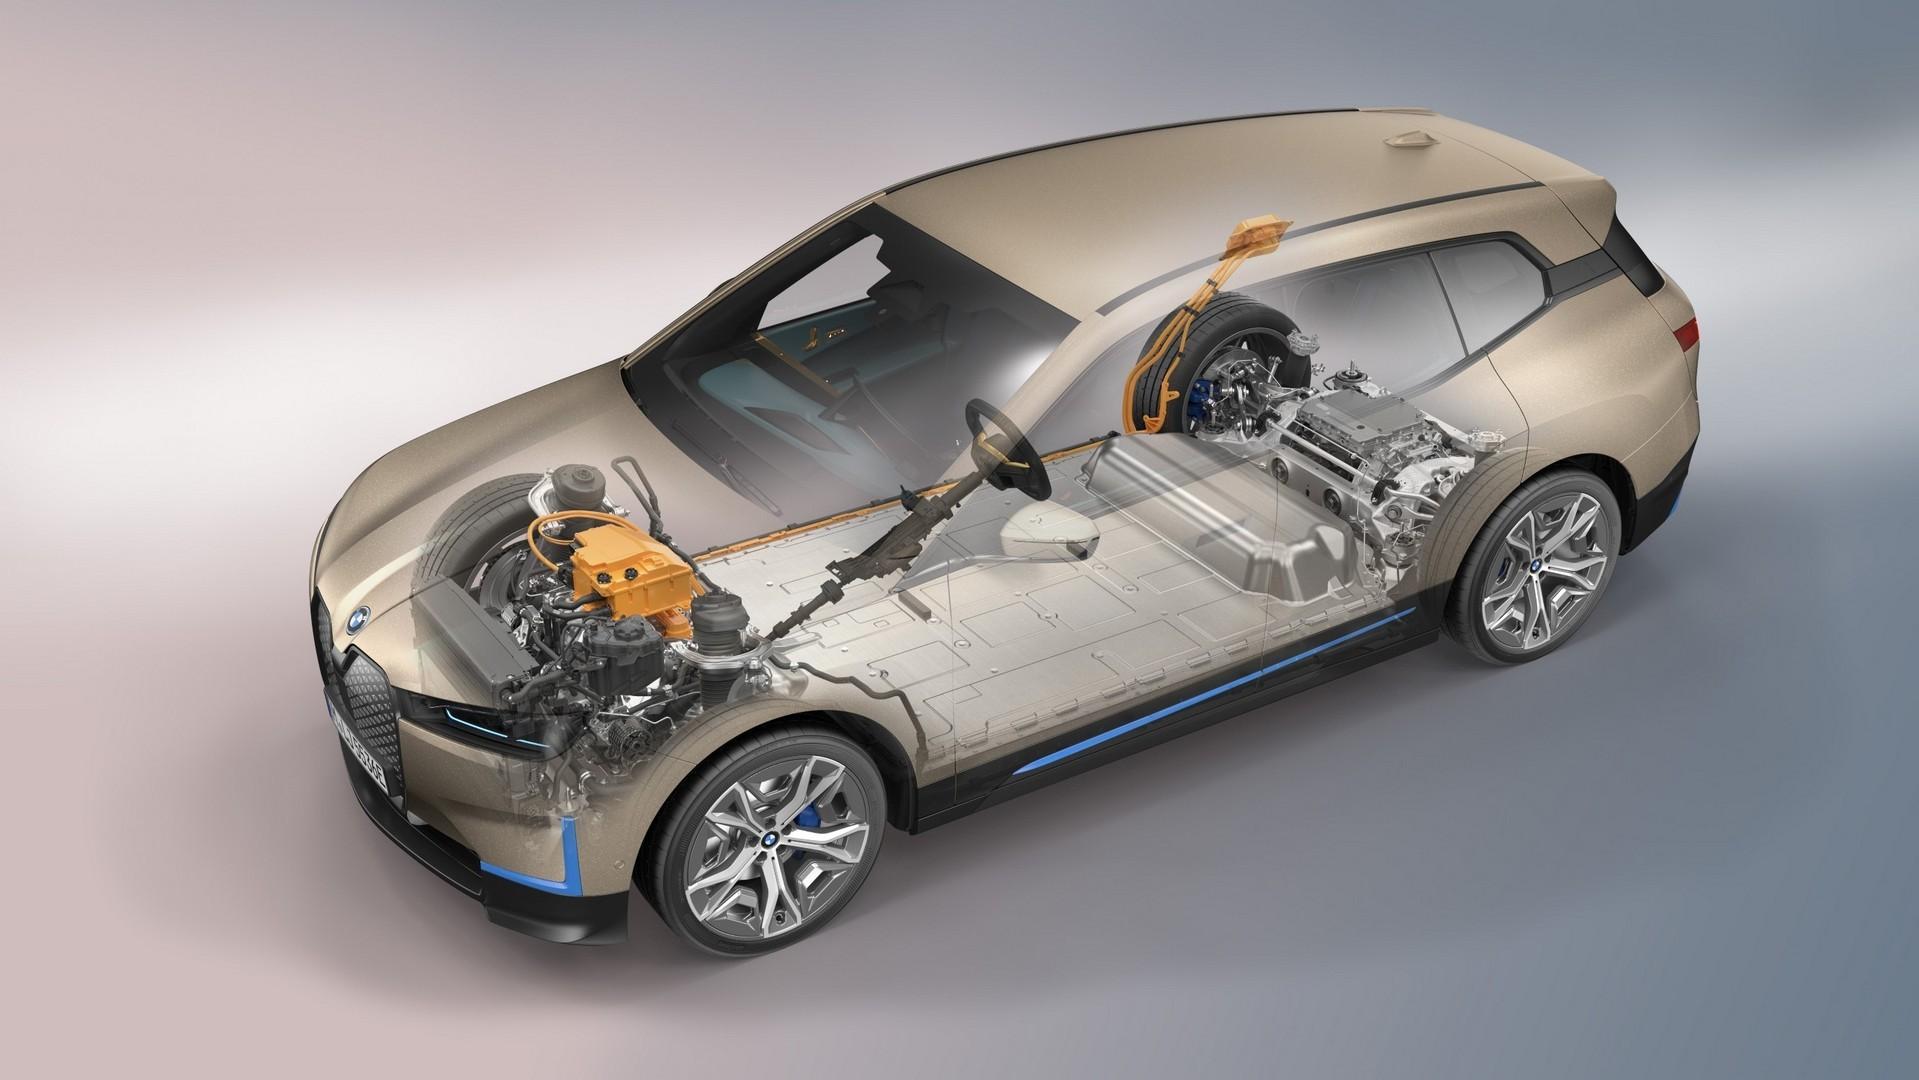 BMW's new iX arrives as firm's flagship EV